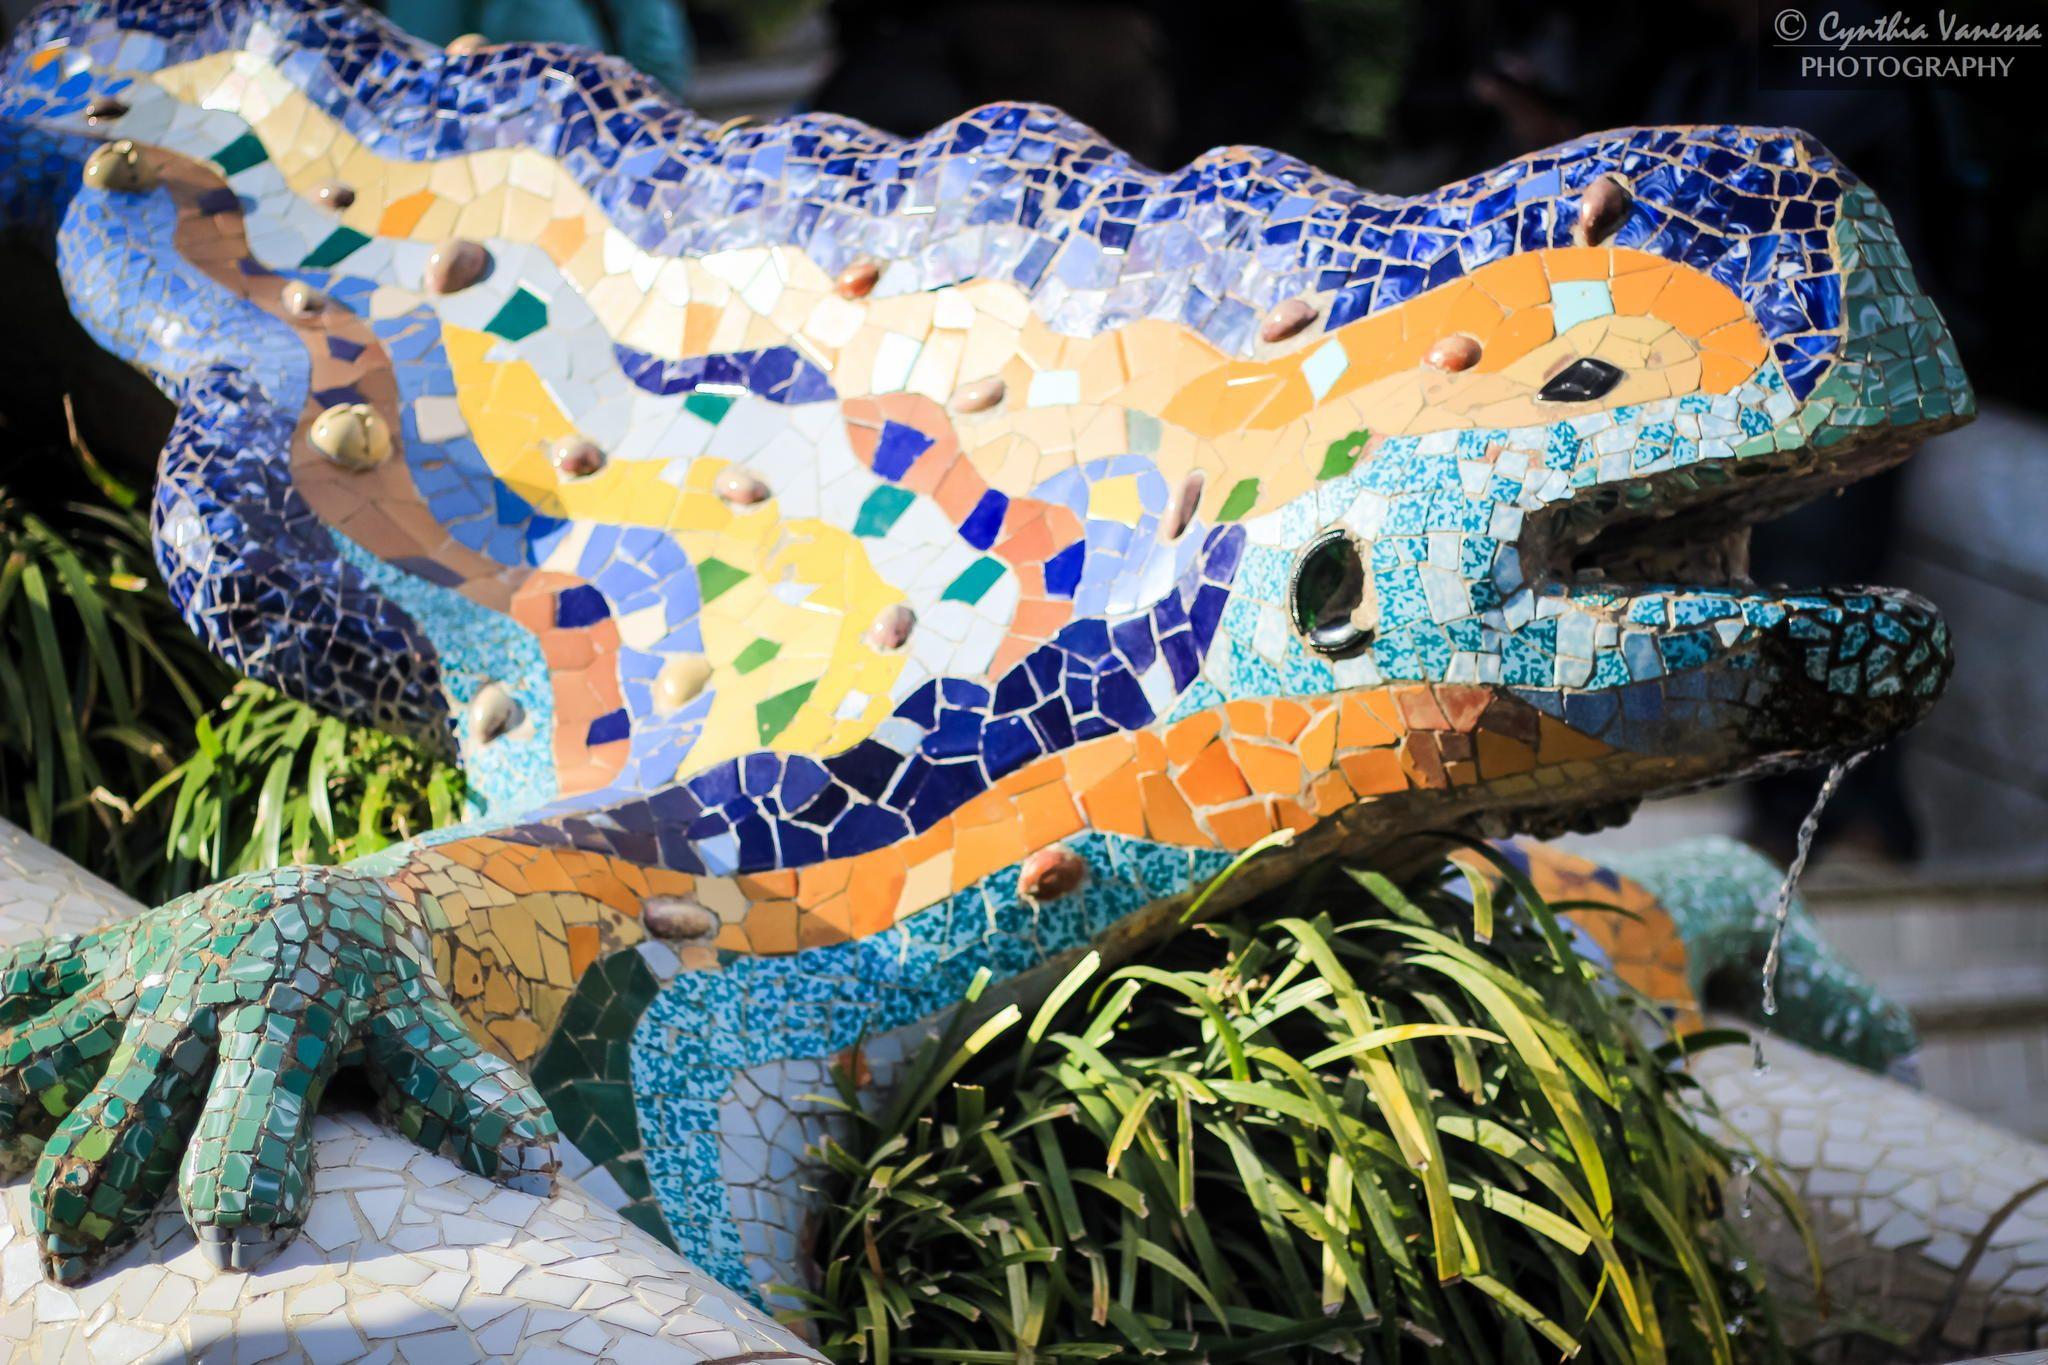 Photograph Salamander of Park Güell by Cynthia Vanessa on 500px